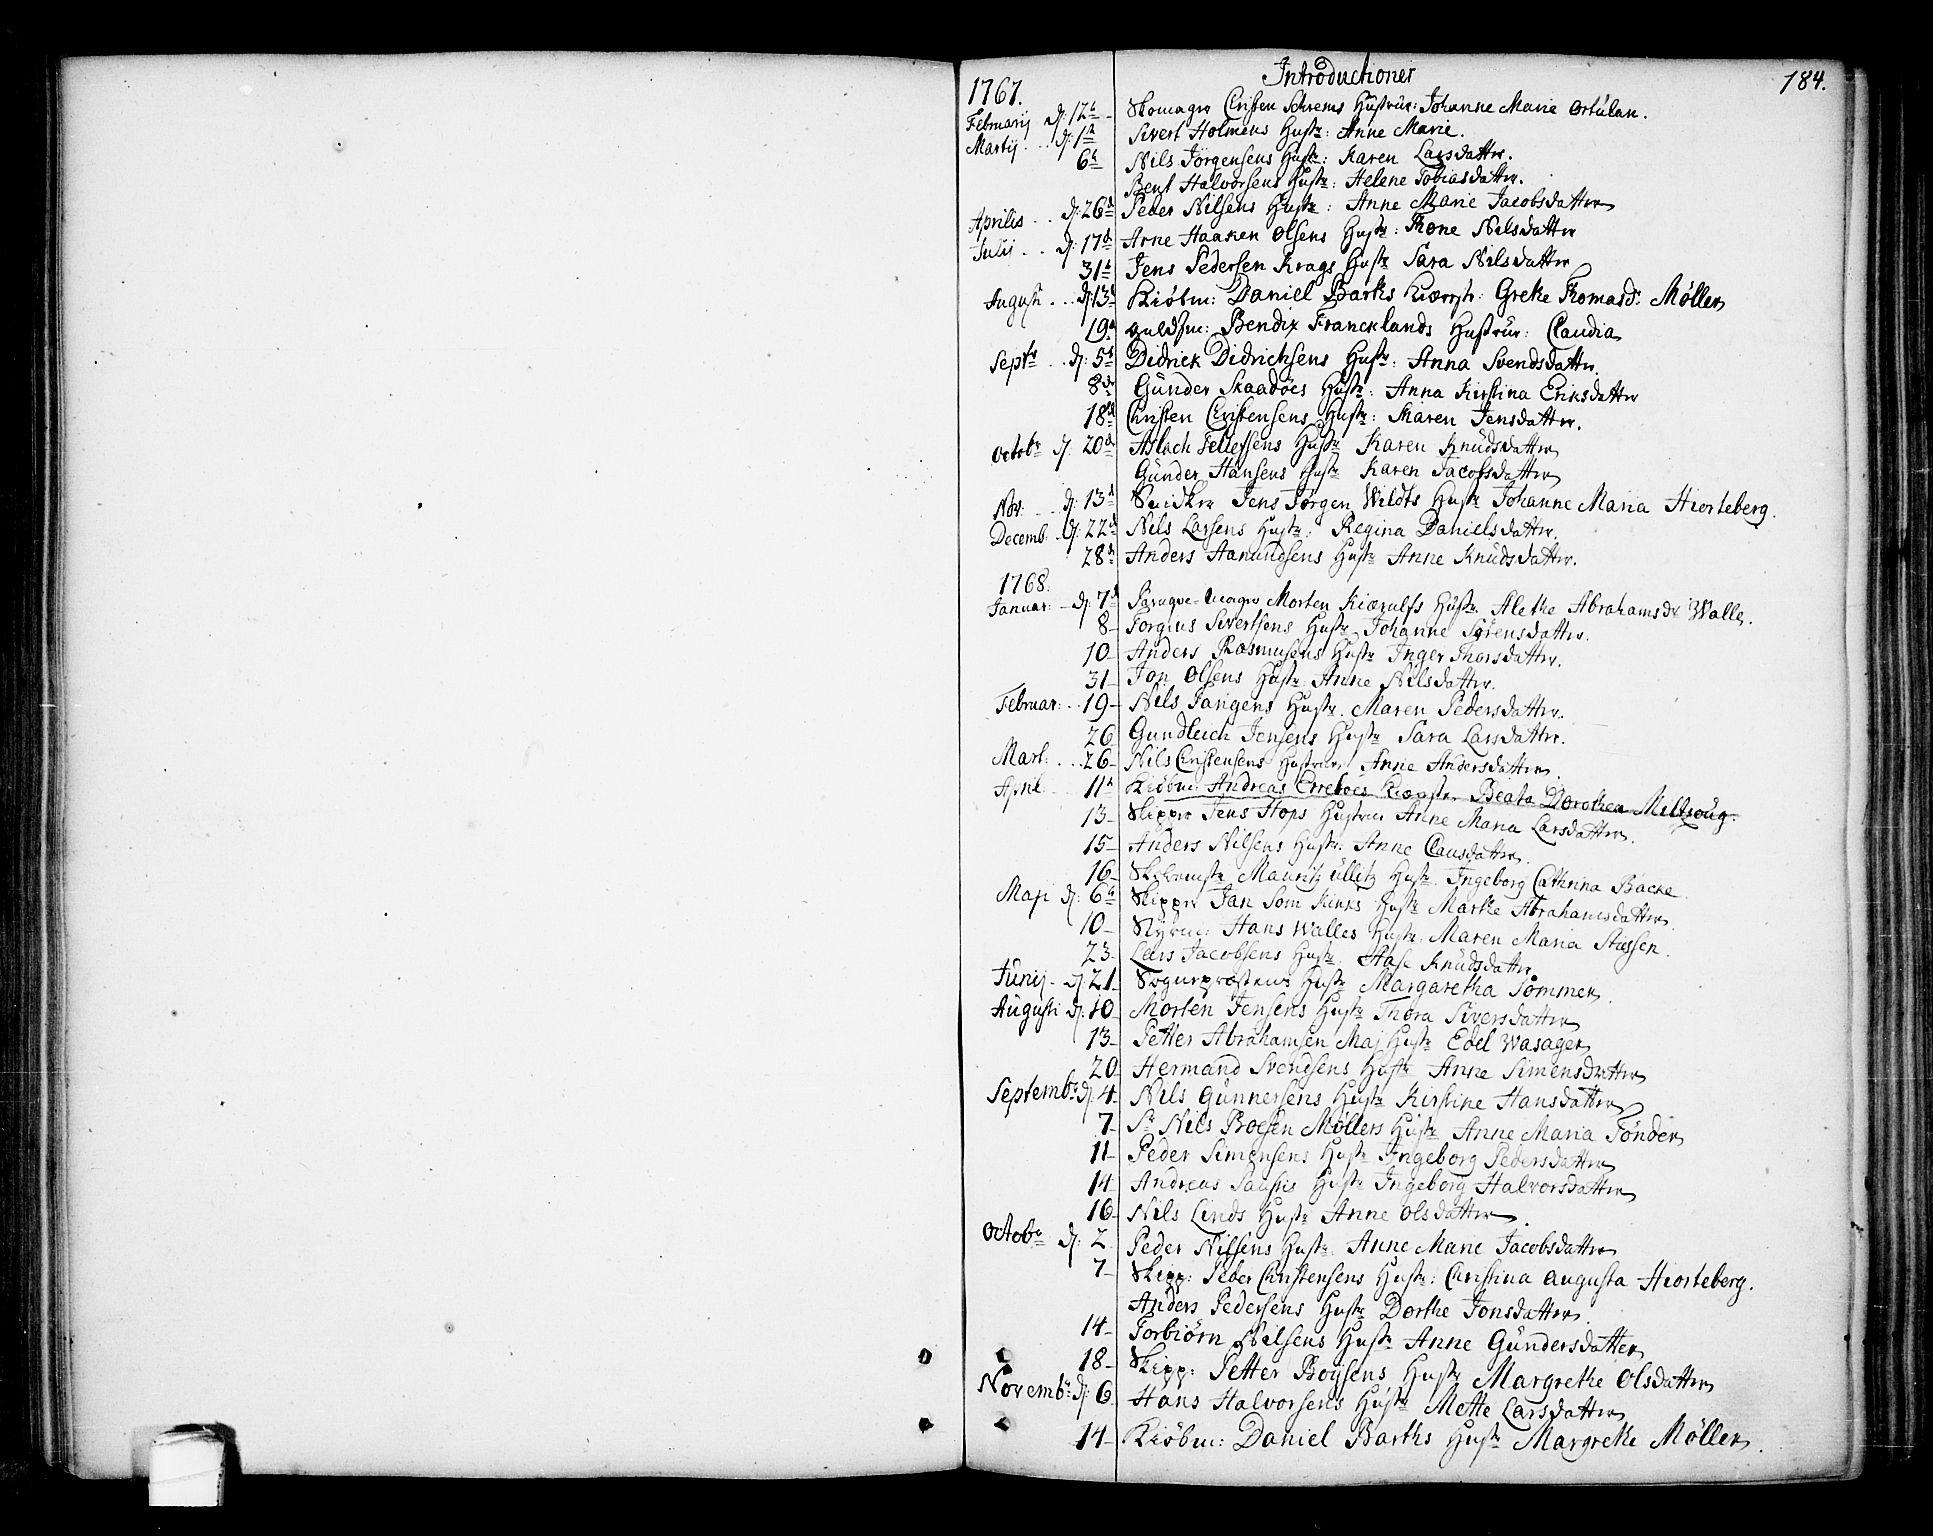 SAKO, Kragerø kirkebøker, F/Fa/L0002: Ministerialbok nr. 2, 1767-1802, s. 184